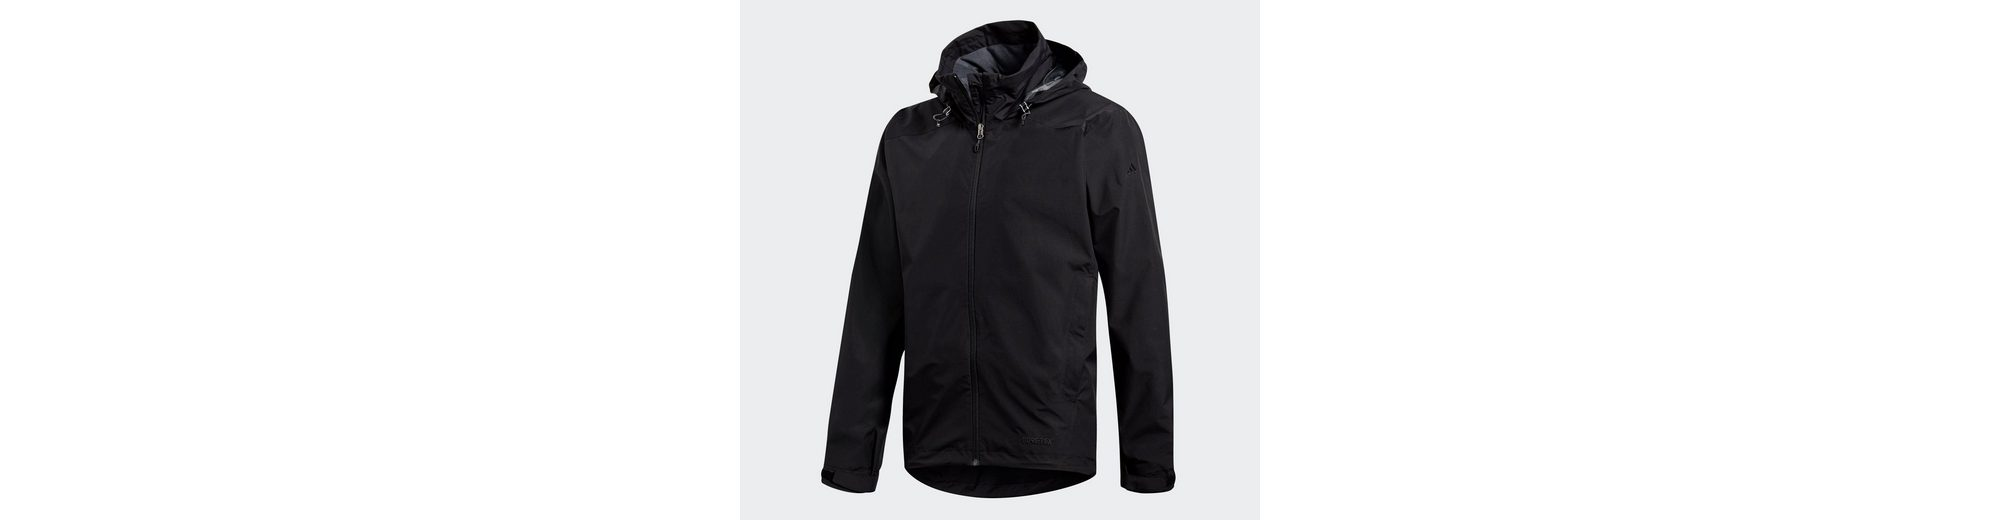 adidas Performance Funktionsjacke Gore-Tex Wandertag 2-Lagen Jacke Bequem Online JJQXe5PVdg